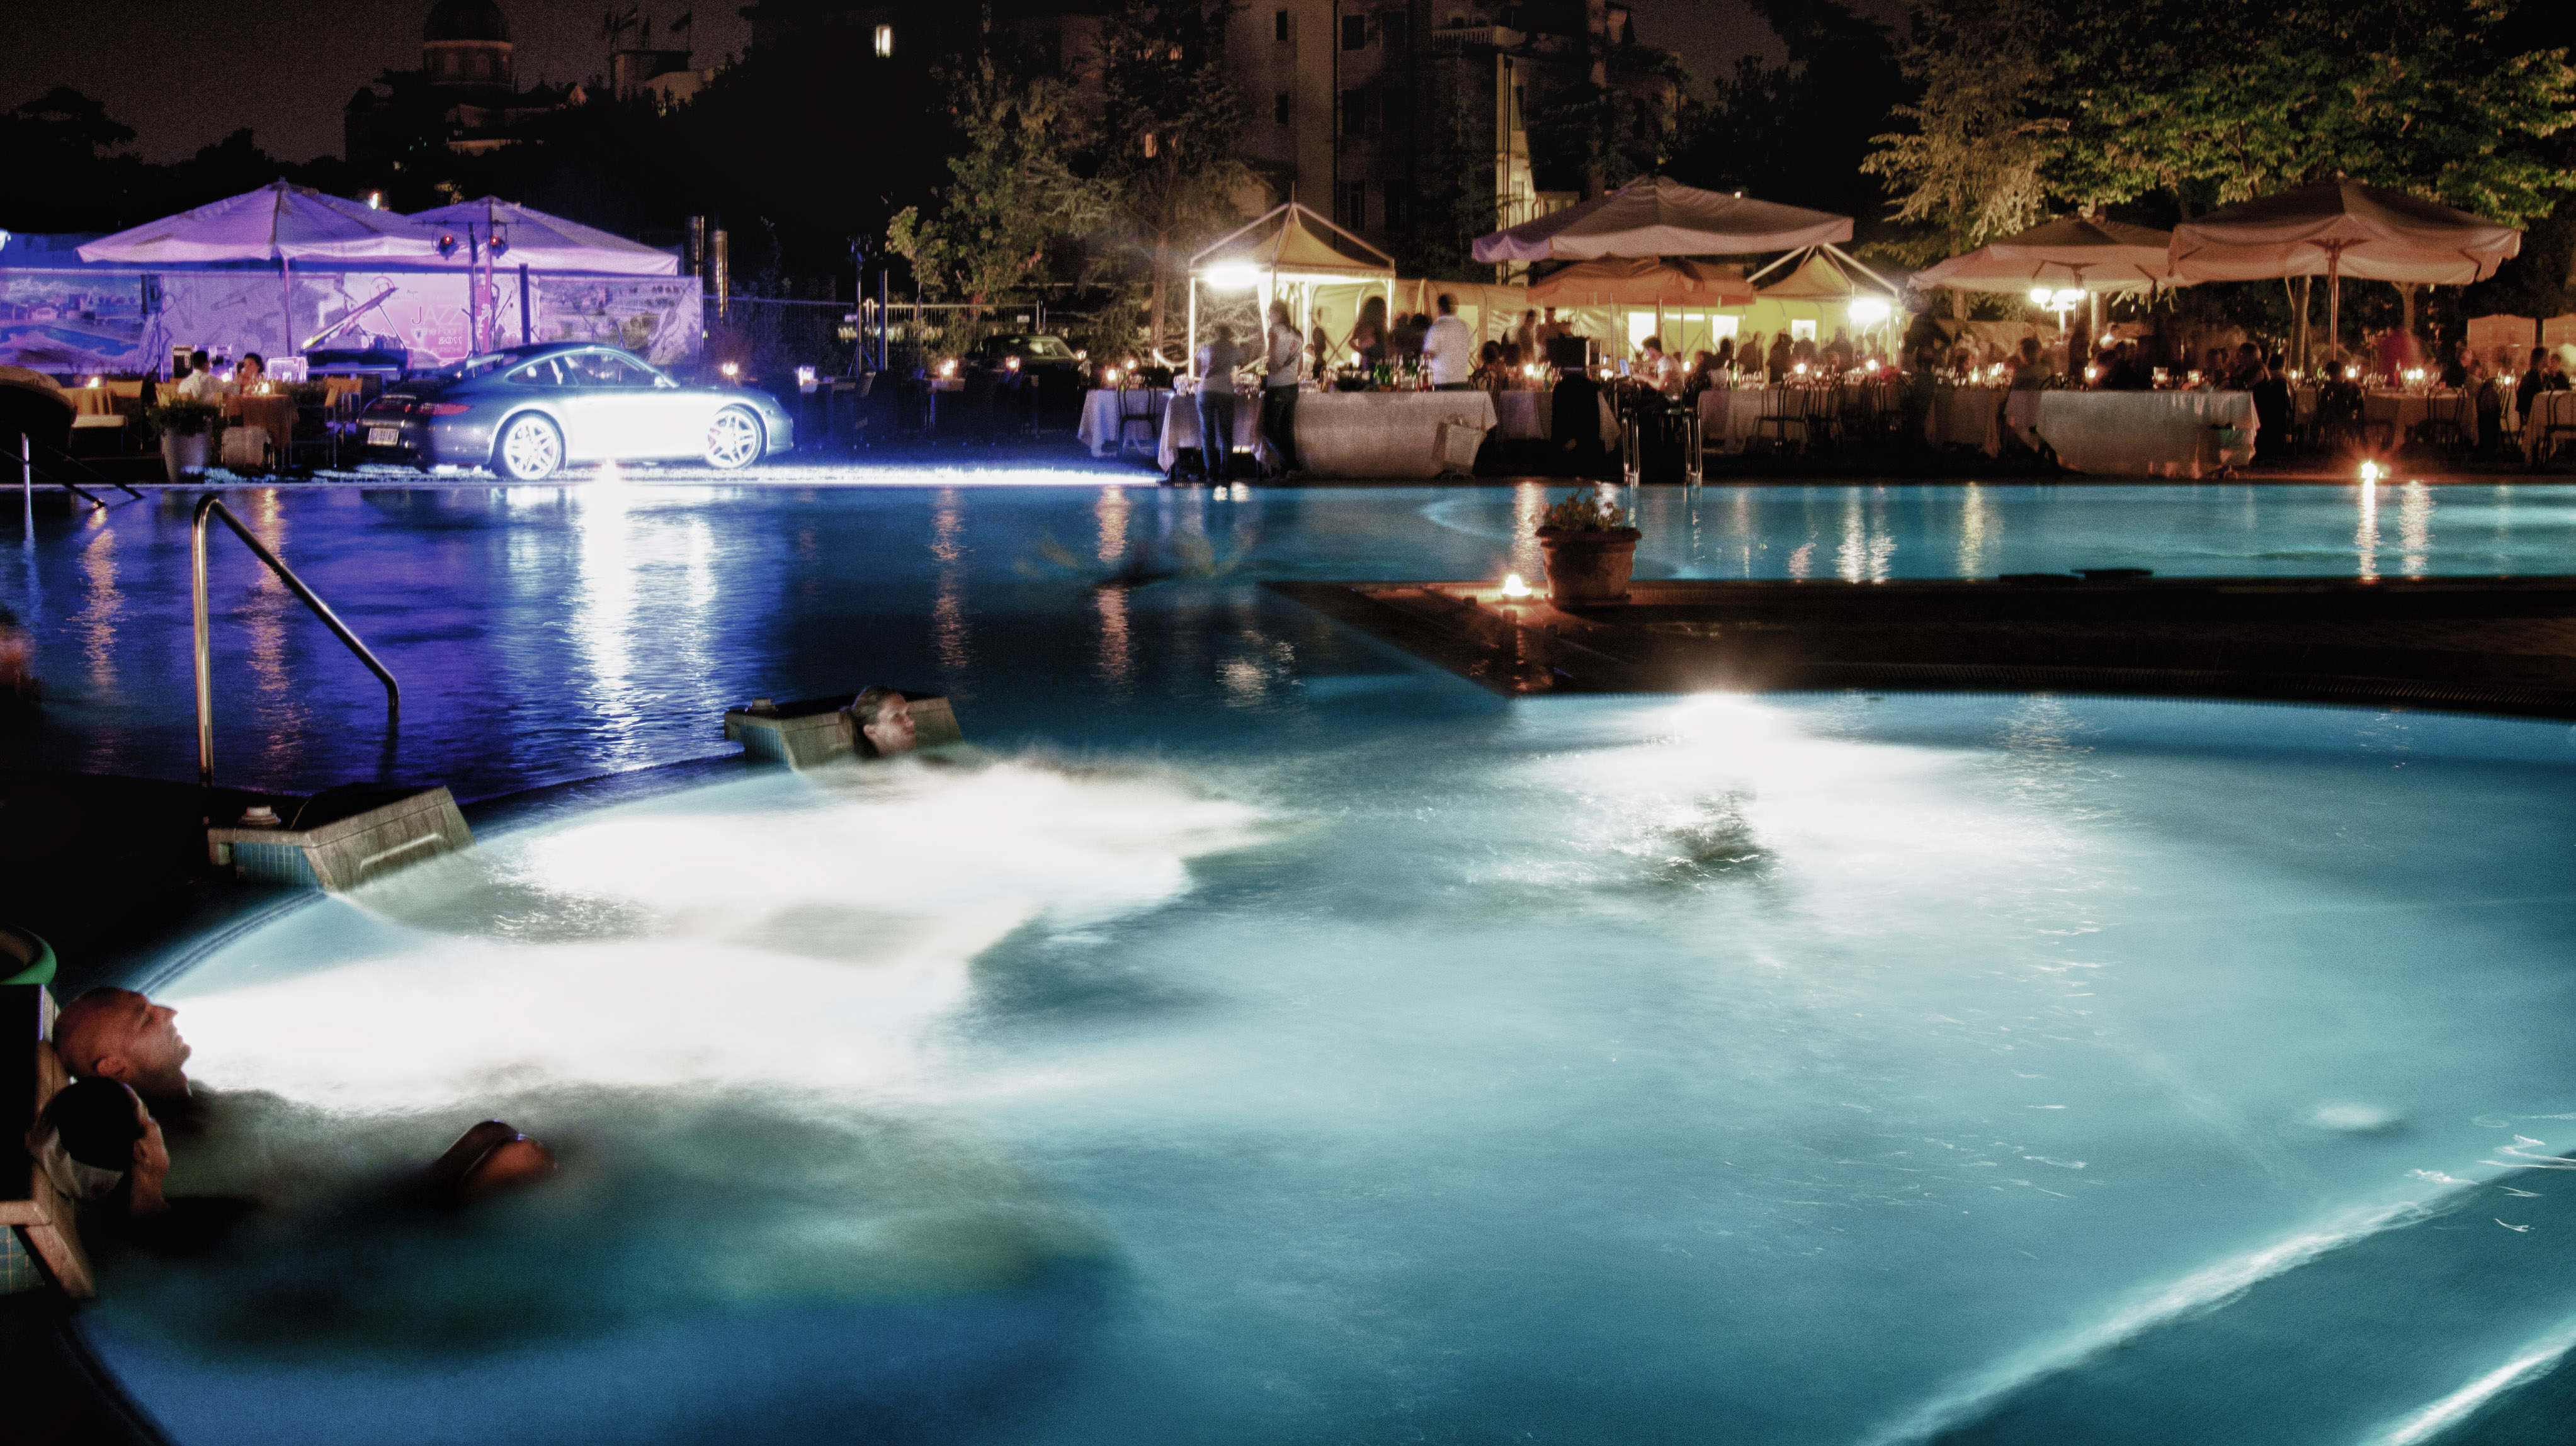 Il ferragosto secondo Jazz by The Pool